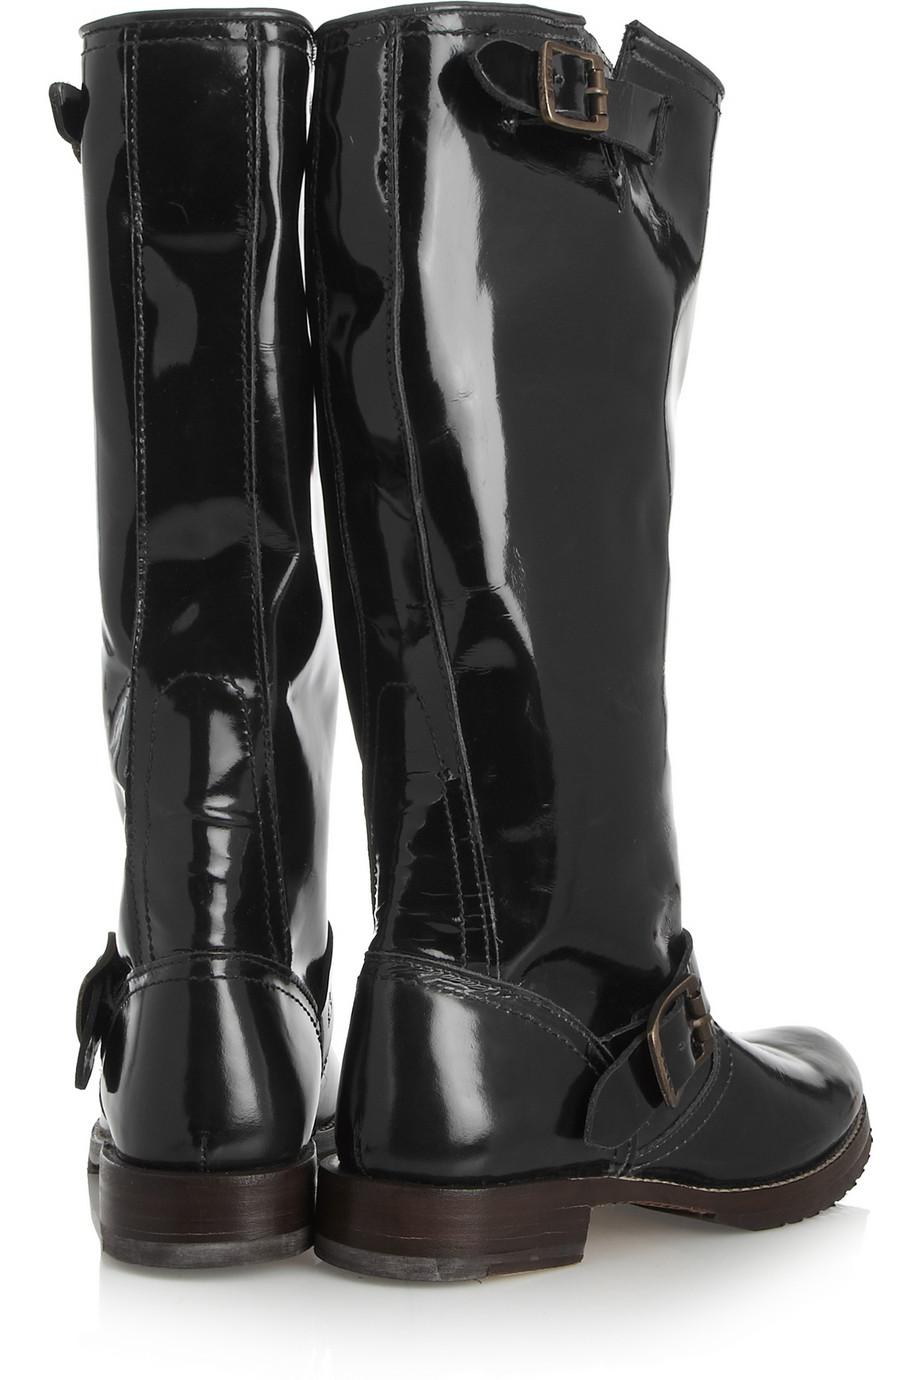 shoeniverse frye black patent leather boots